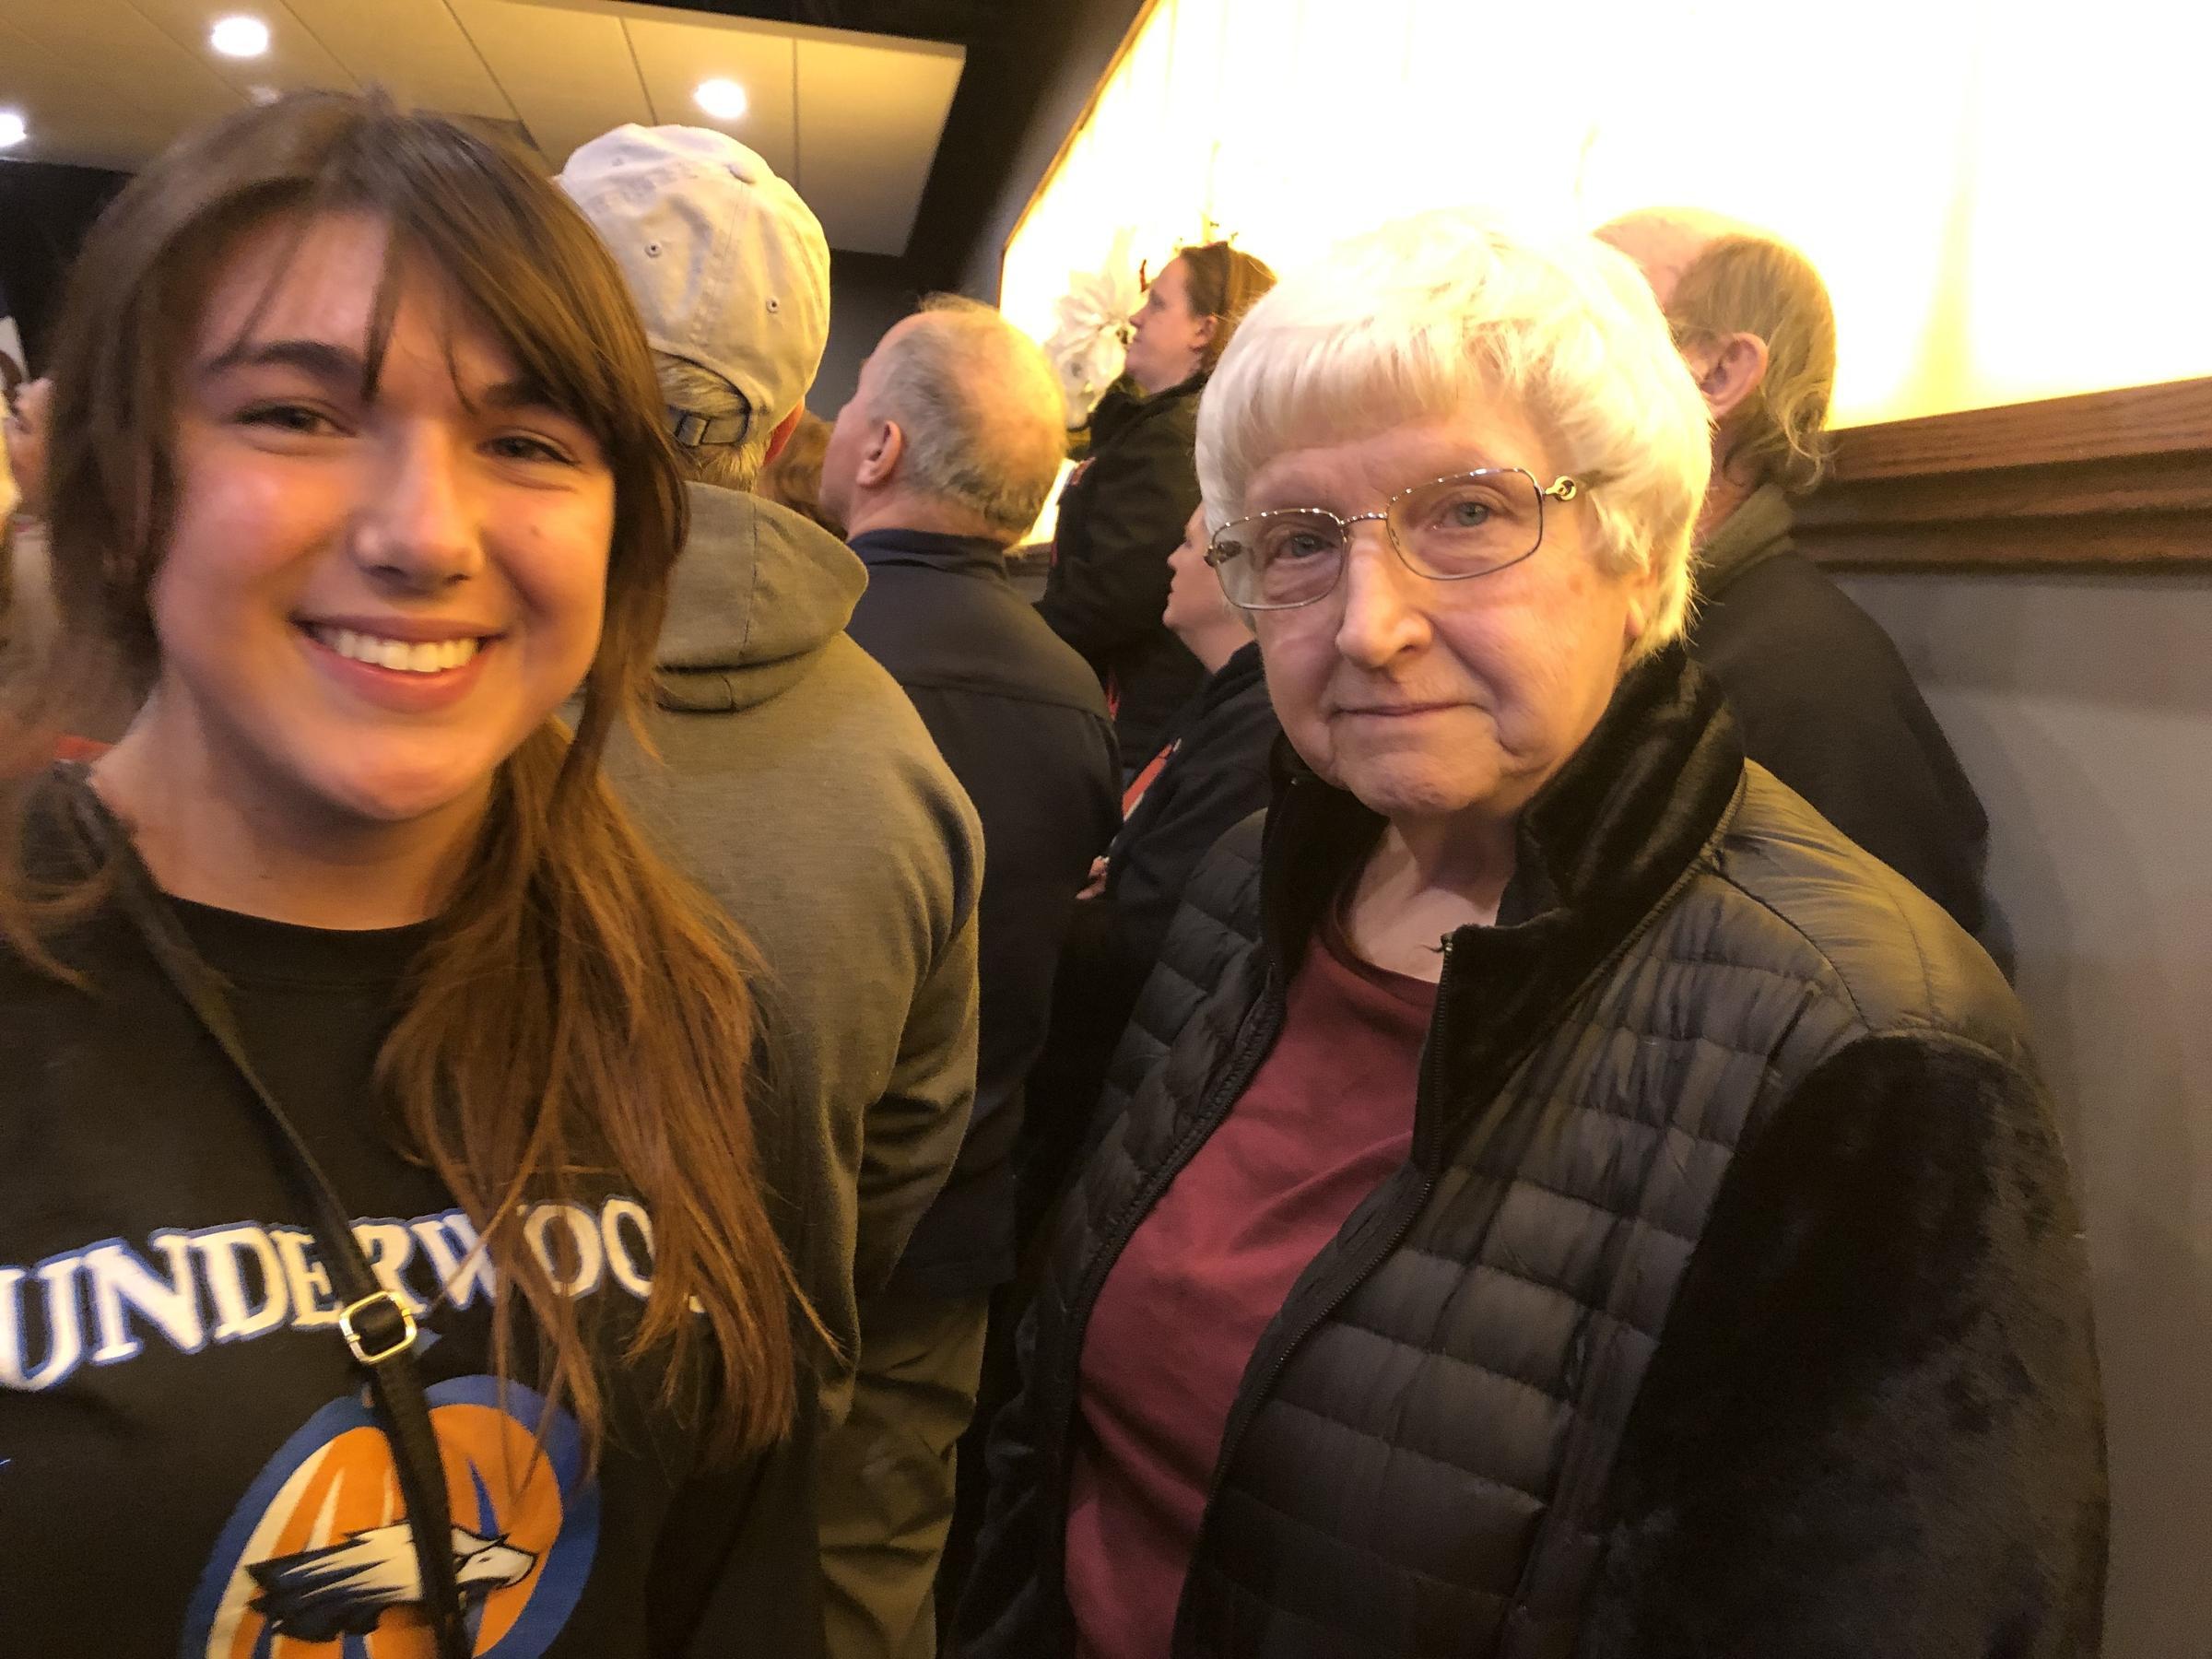 Marilynn Leggio right and her granddaughter Maggie Bashore at an Elizabeth Warren event in Council Bluffs Iowa